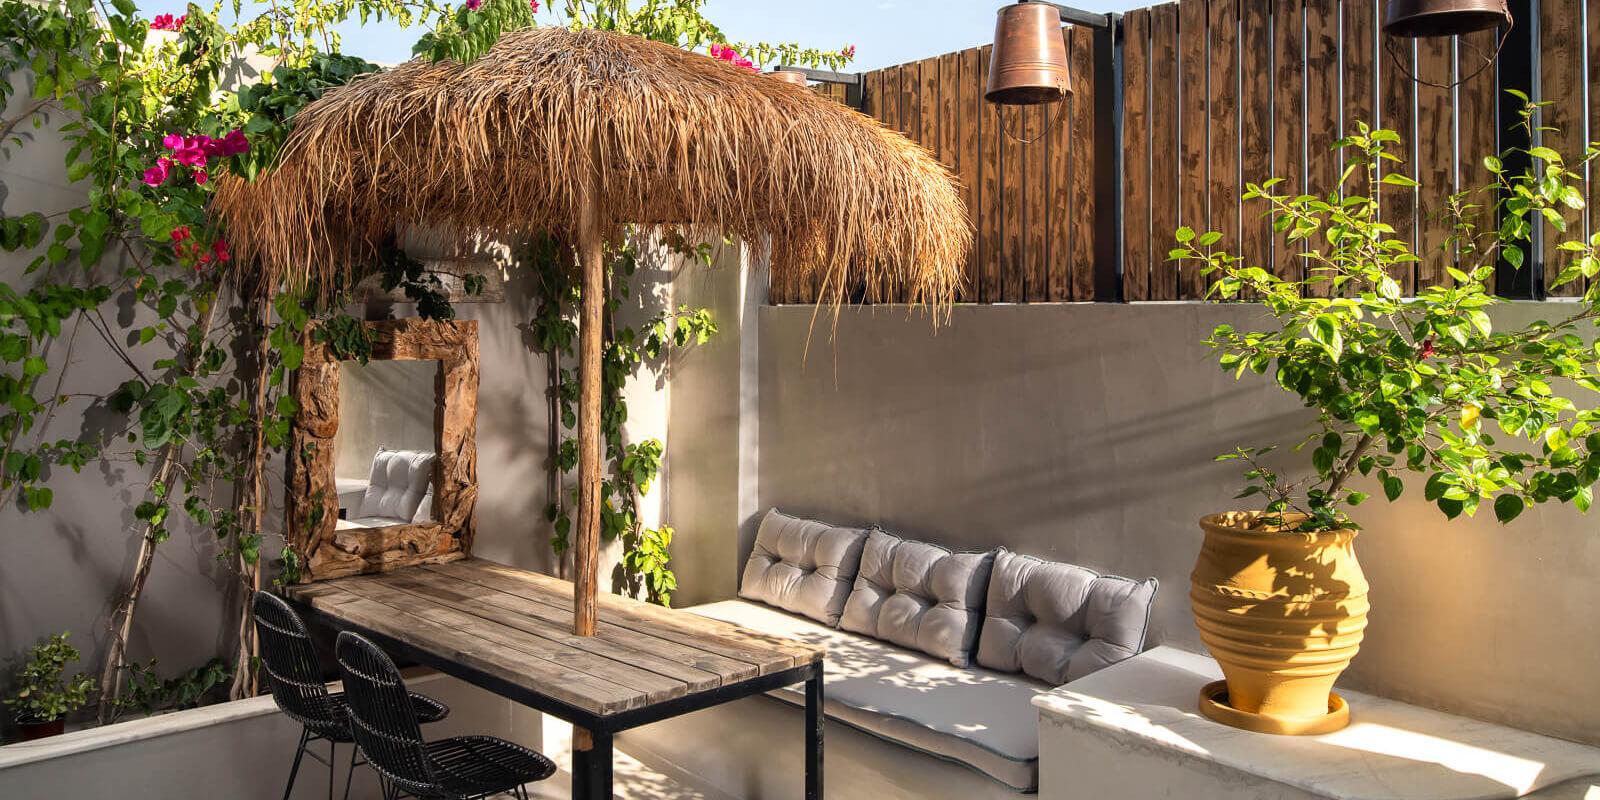 Iviskos-Suite-Private-Terrace-Elakati-Hotel-in-Rhodes-Greece1